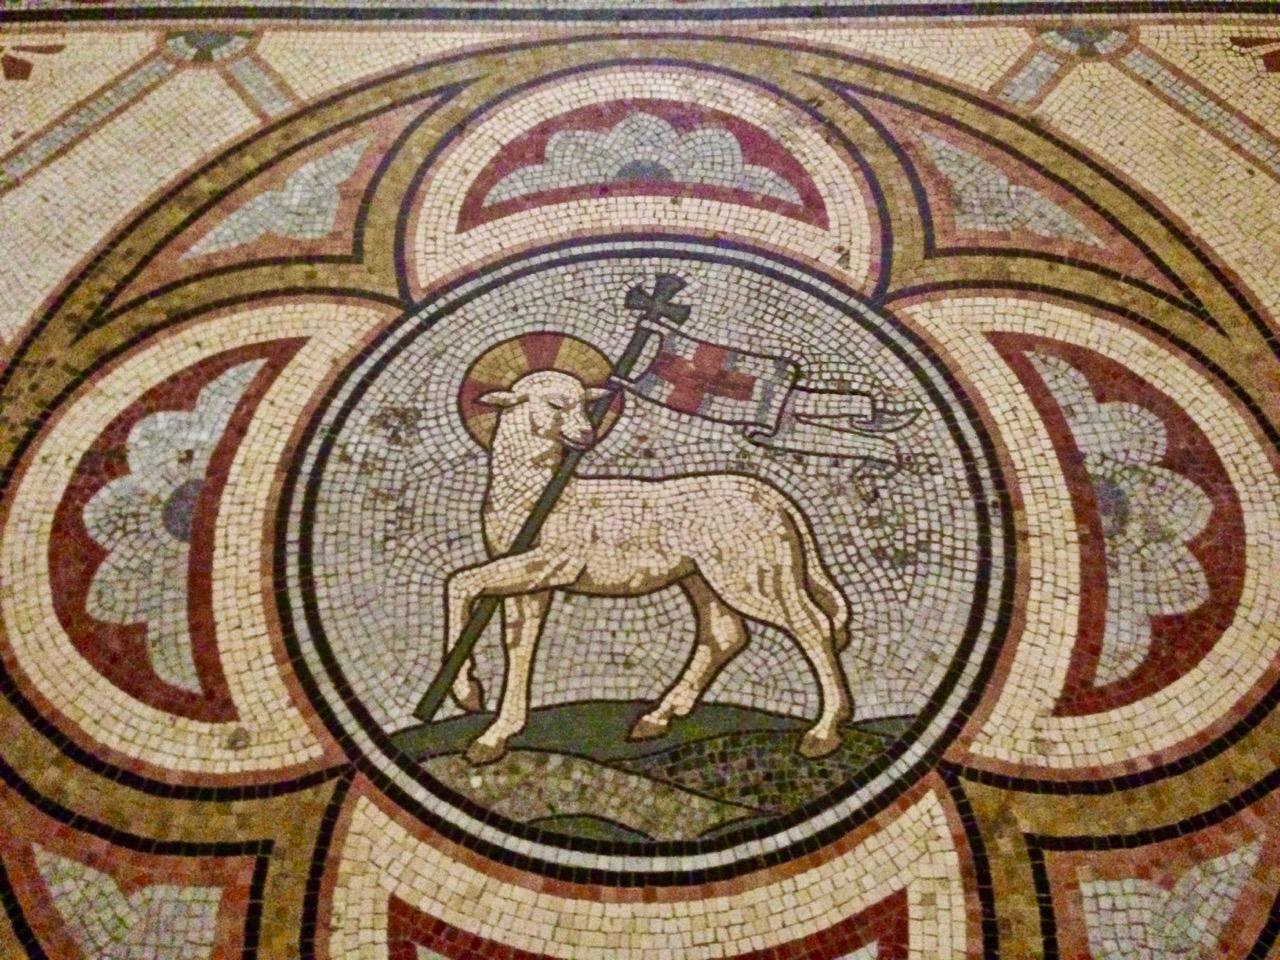 lamb with pennant kilkenny